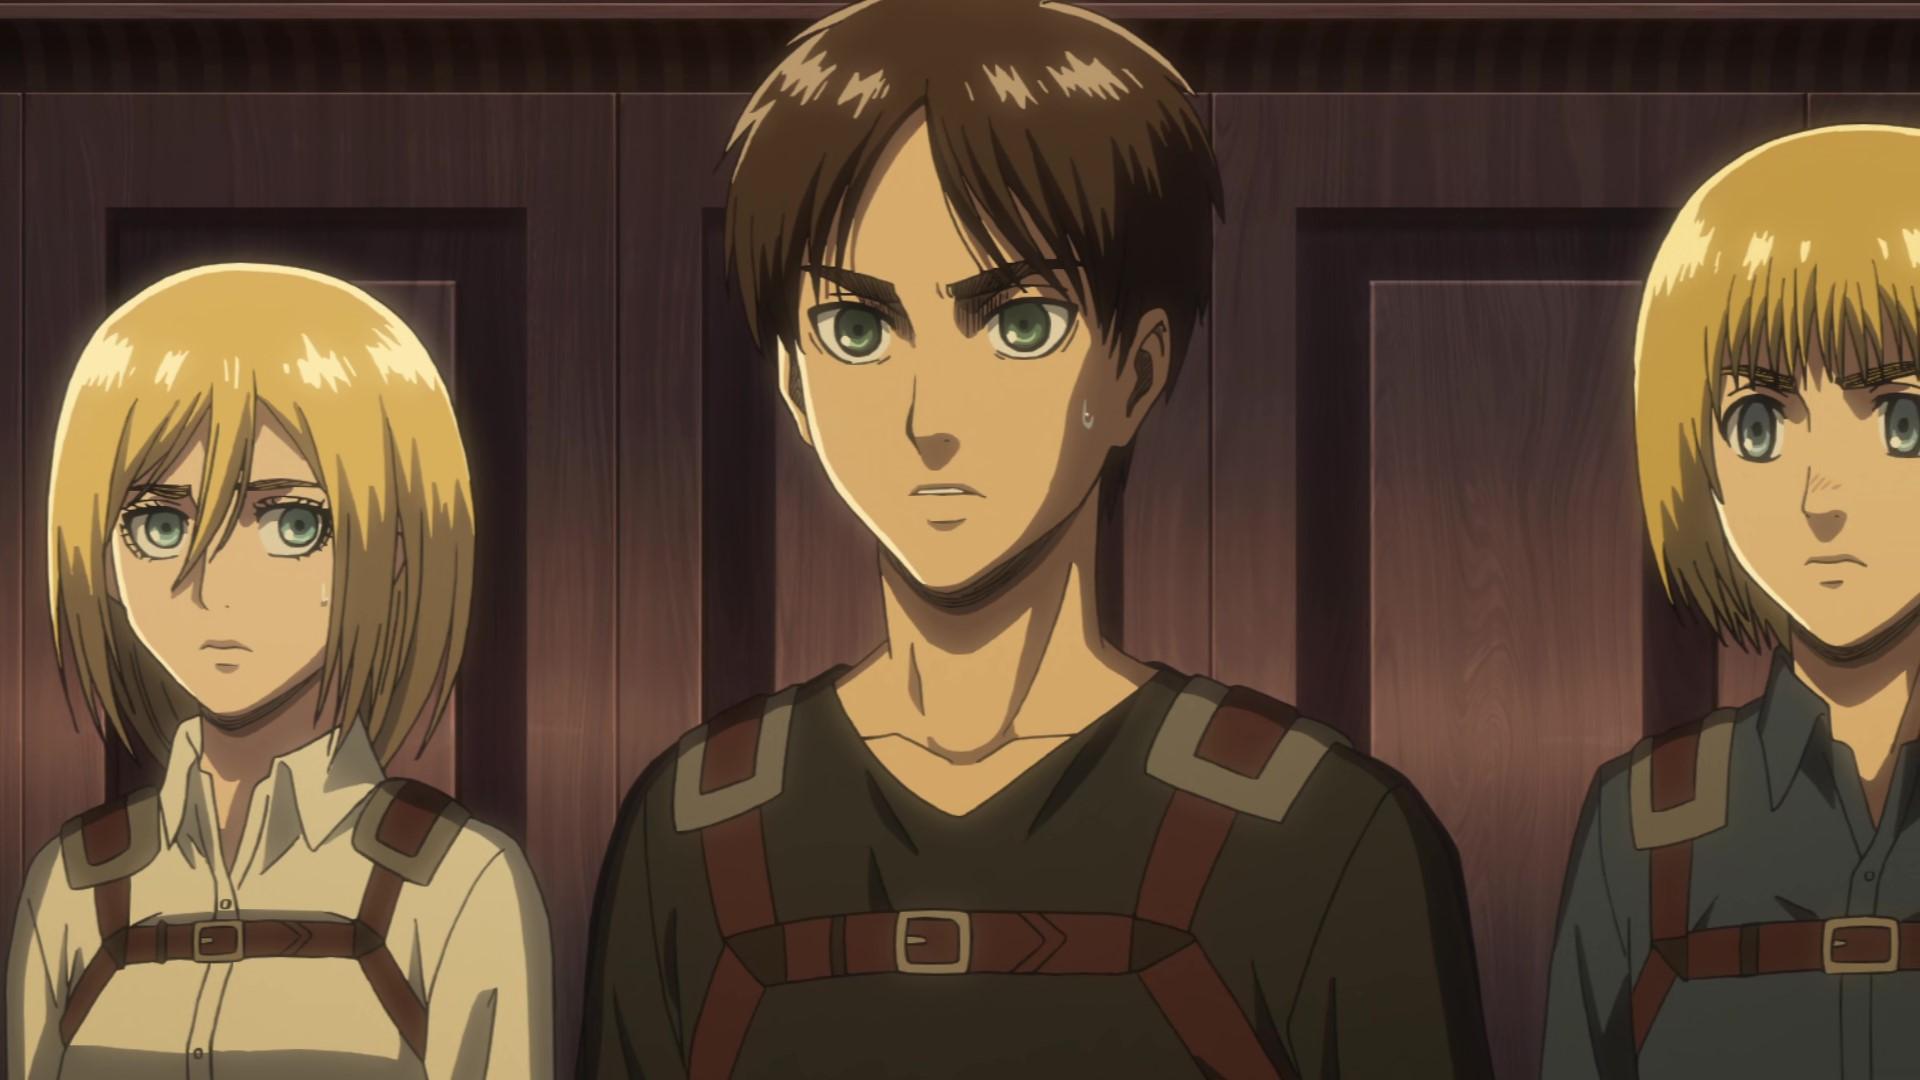 Attack on Titan Season 3 Episode 9 English Dubbed - AnimeGT